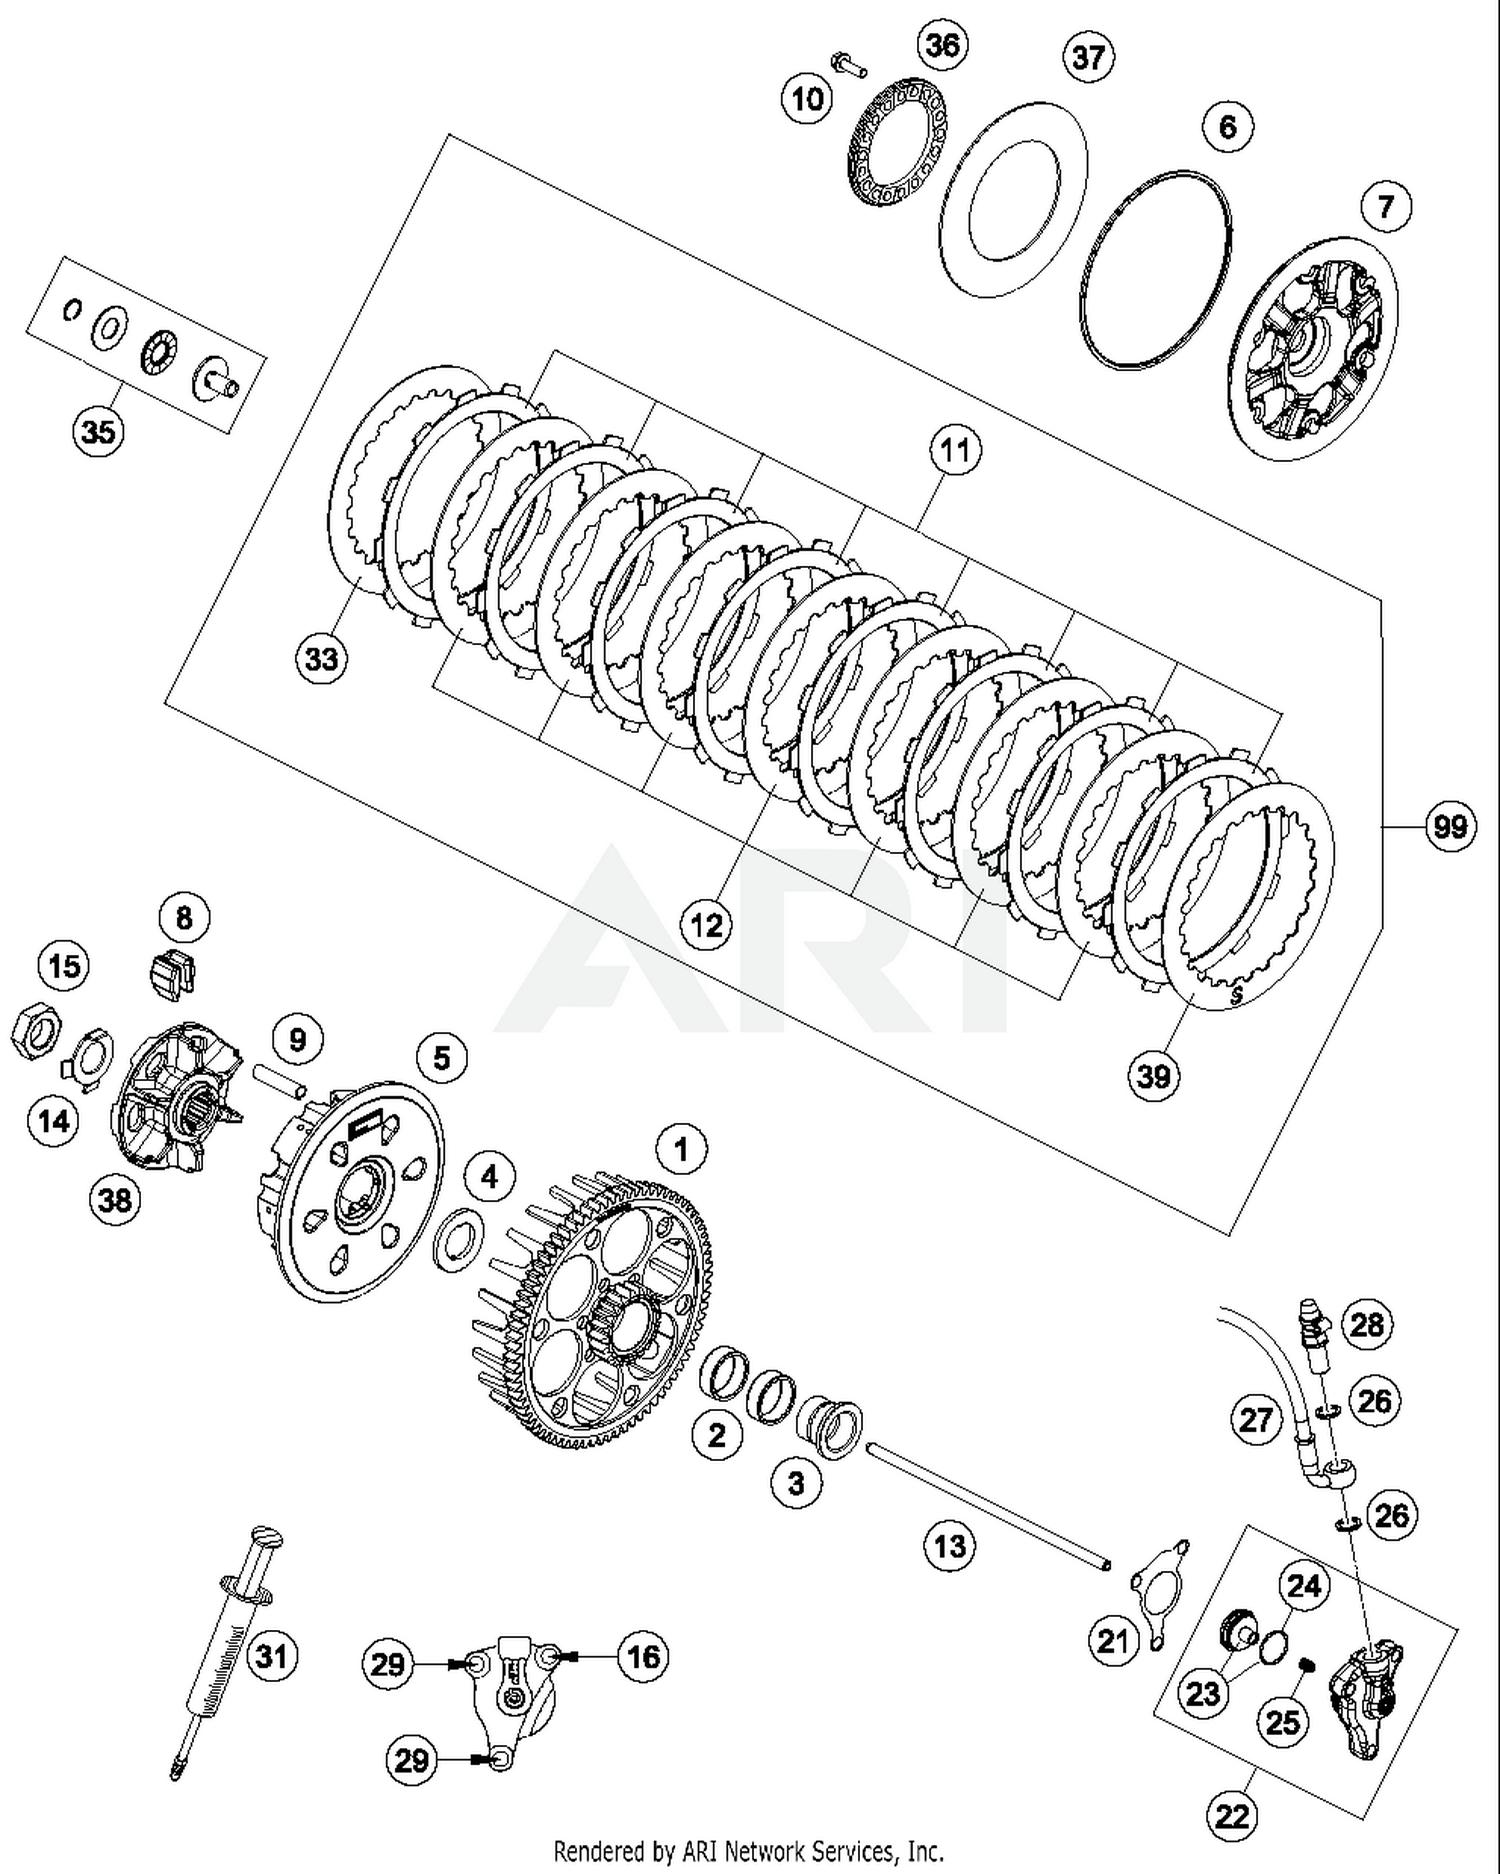 Ktm 500 Clutch Diagram Enthusiast Wiring Diagrams Engine 2017 Exc F Parts Best Oem For Rh Bikebandit Com Dirt Bikes